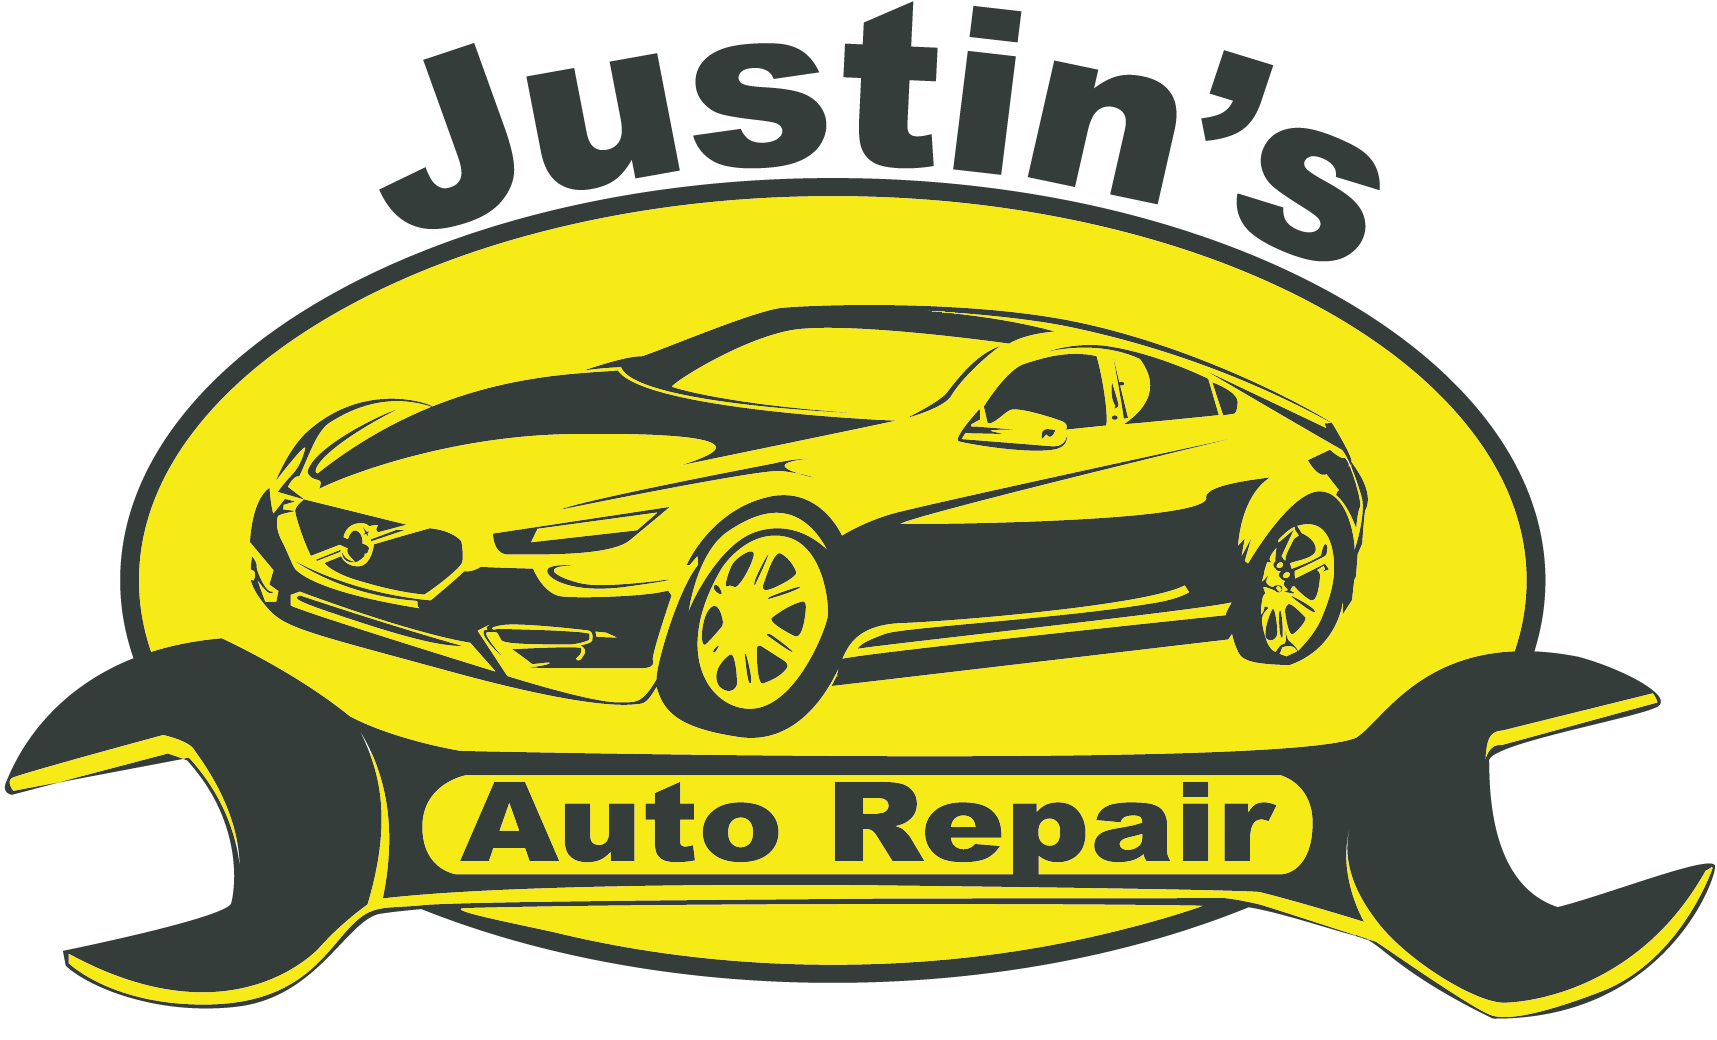 Engine clipart mechanic shop. Home justin s auto